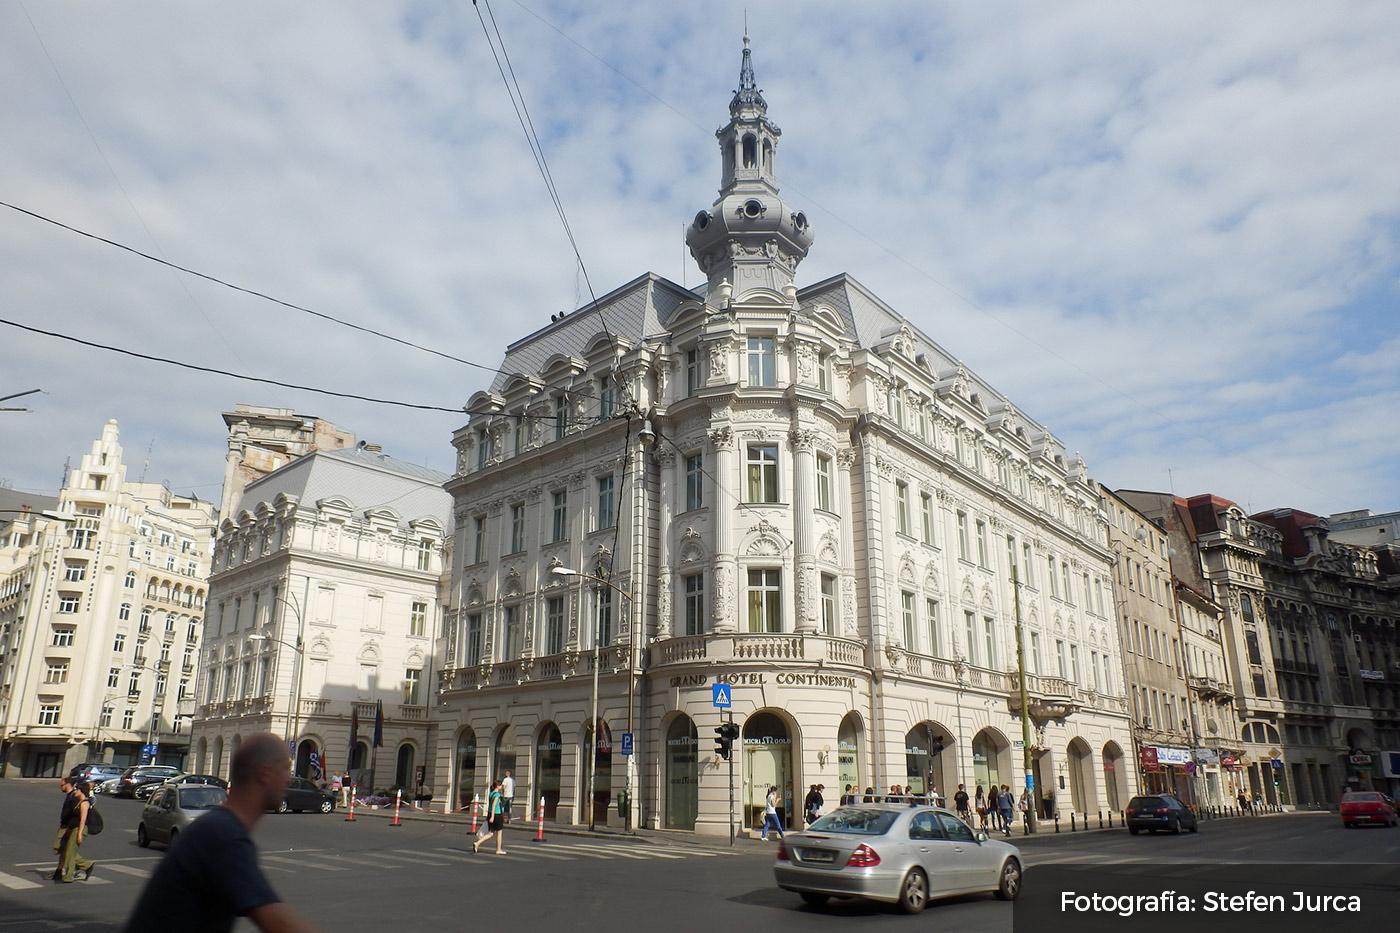 Bucarest-1_Stefen-Jurca